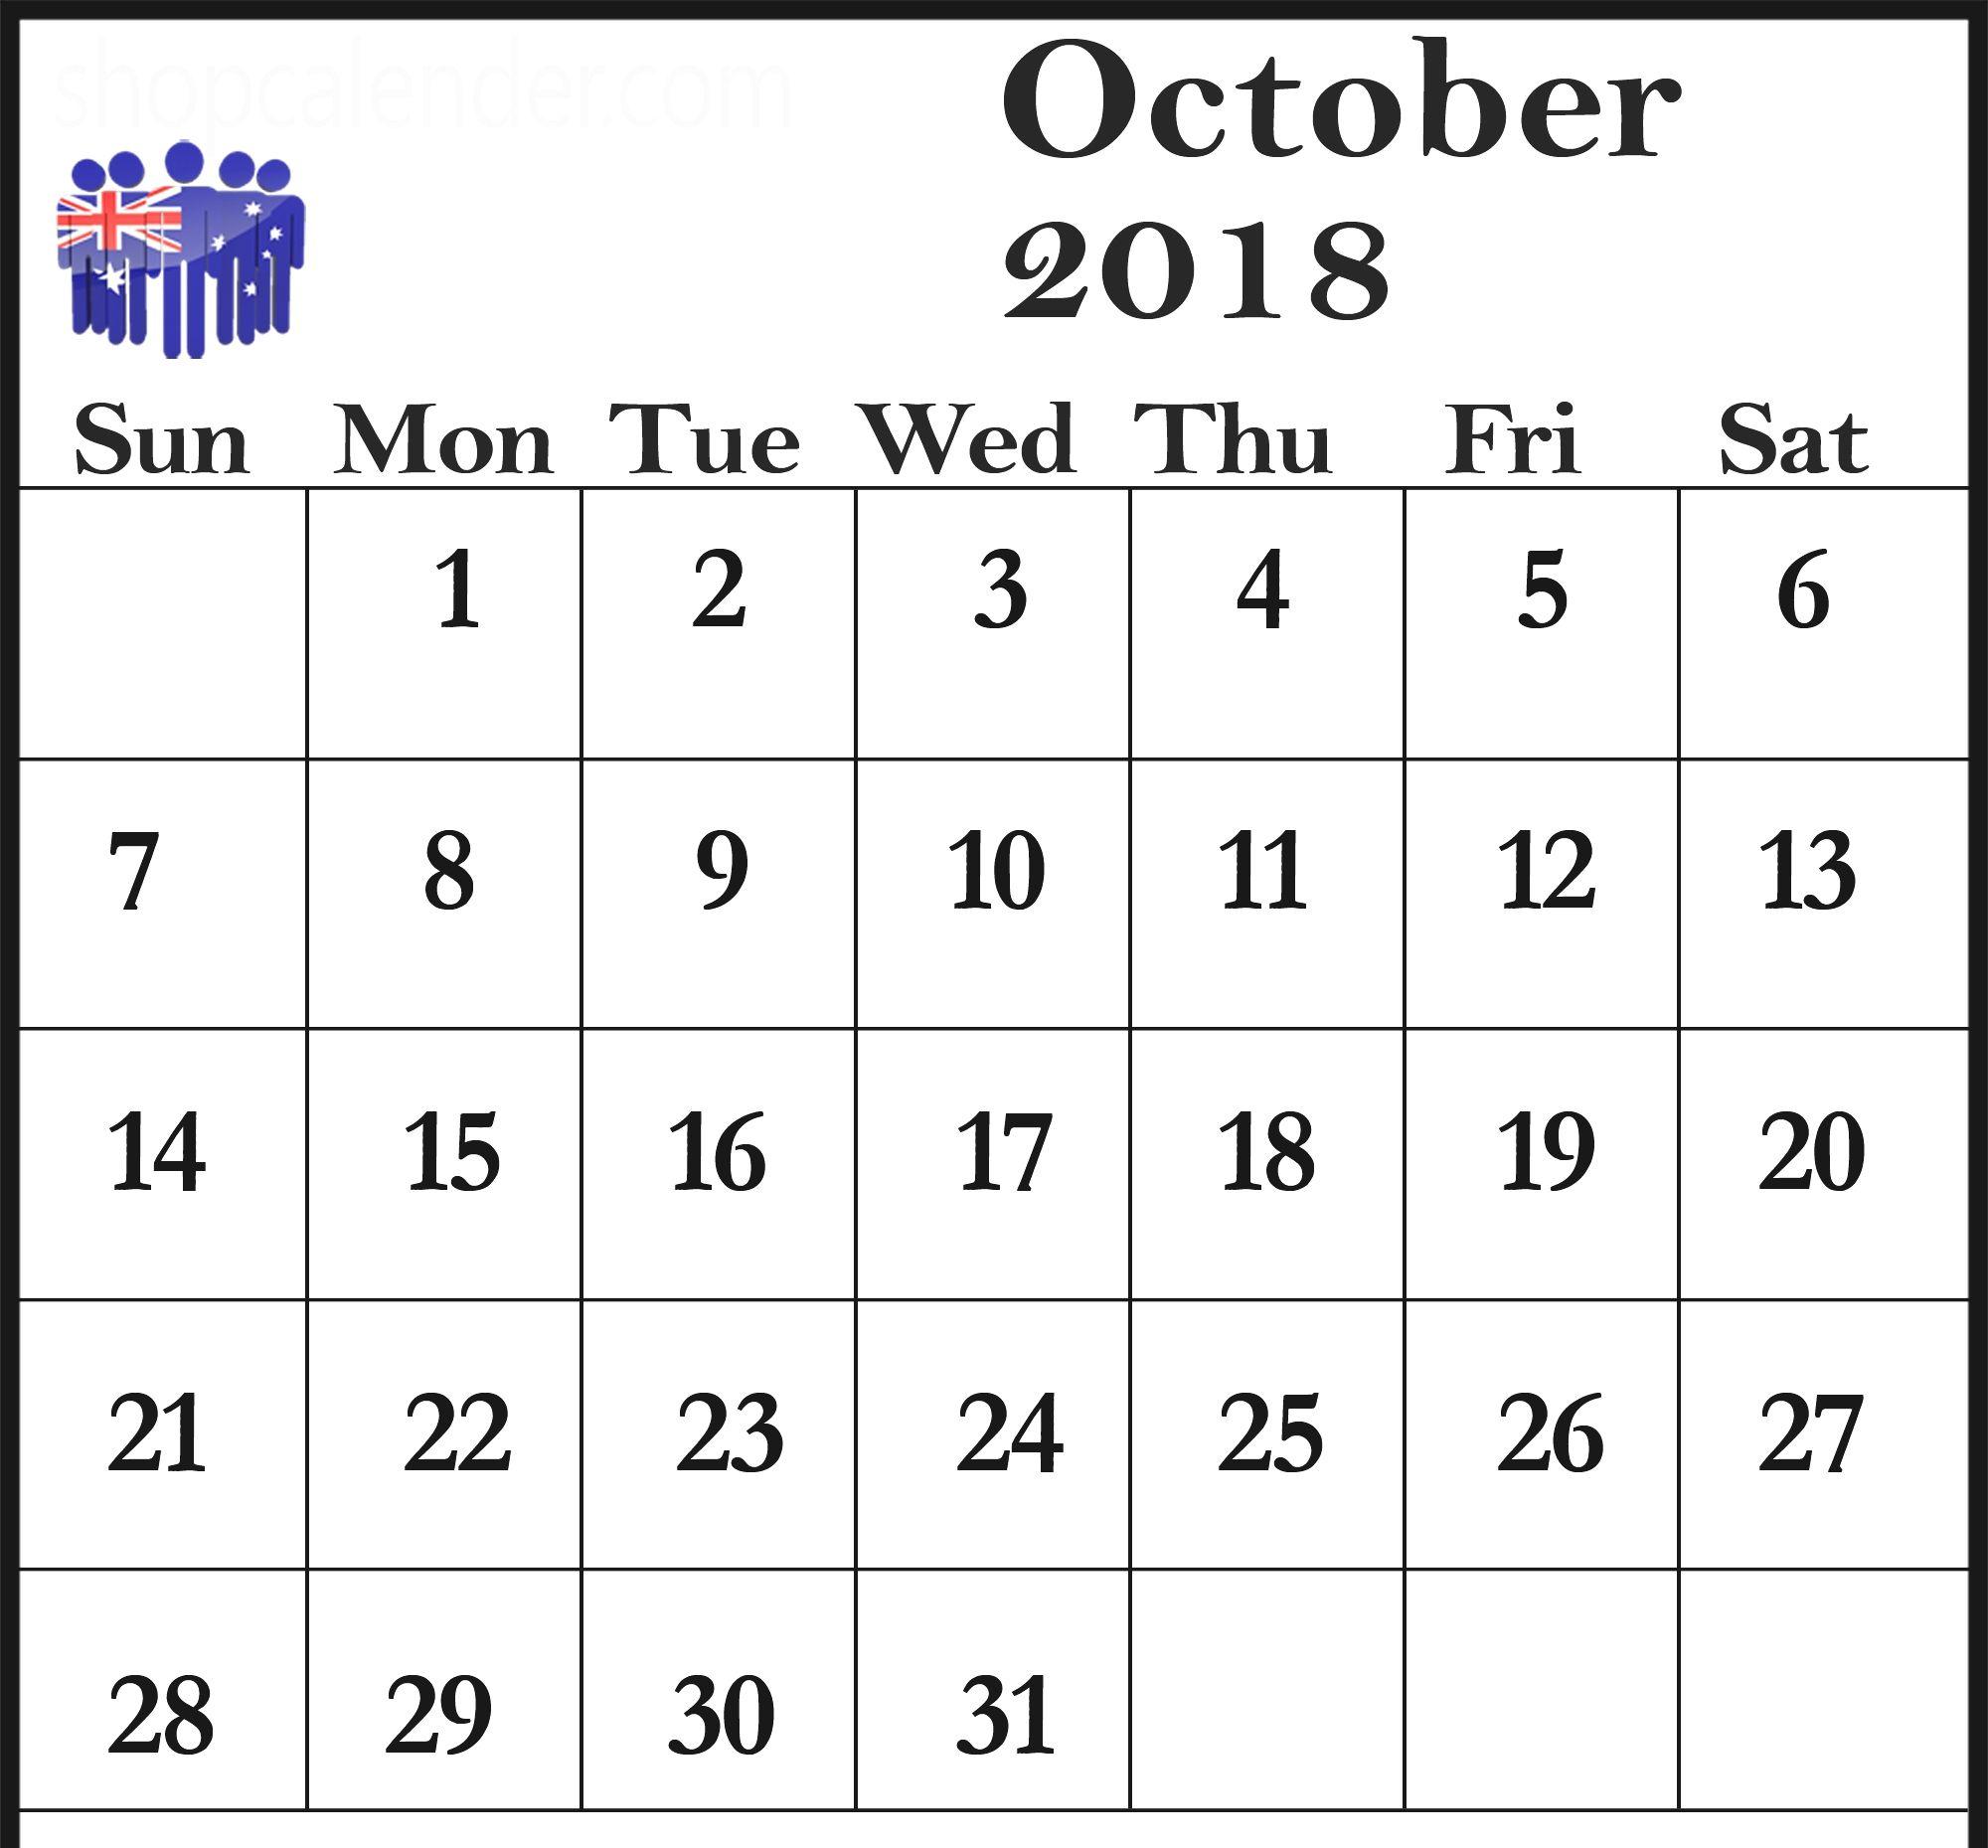 October 2018 Monthly Calendar Editable Template October 2018